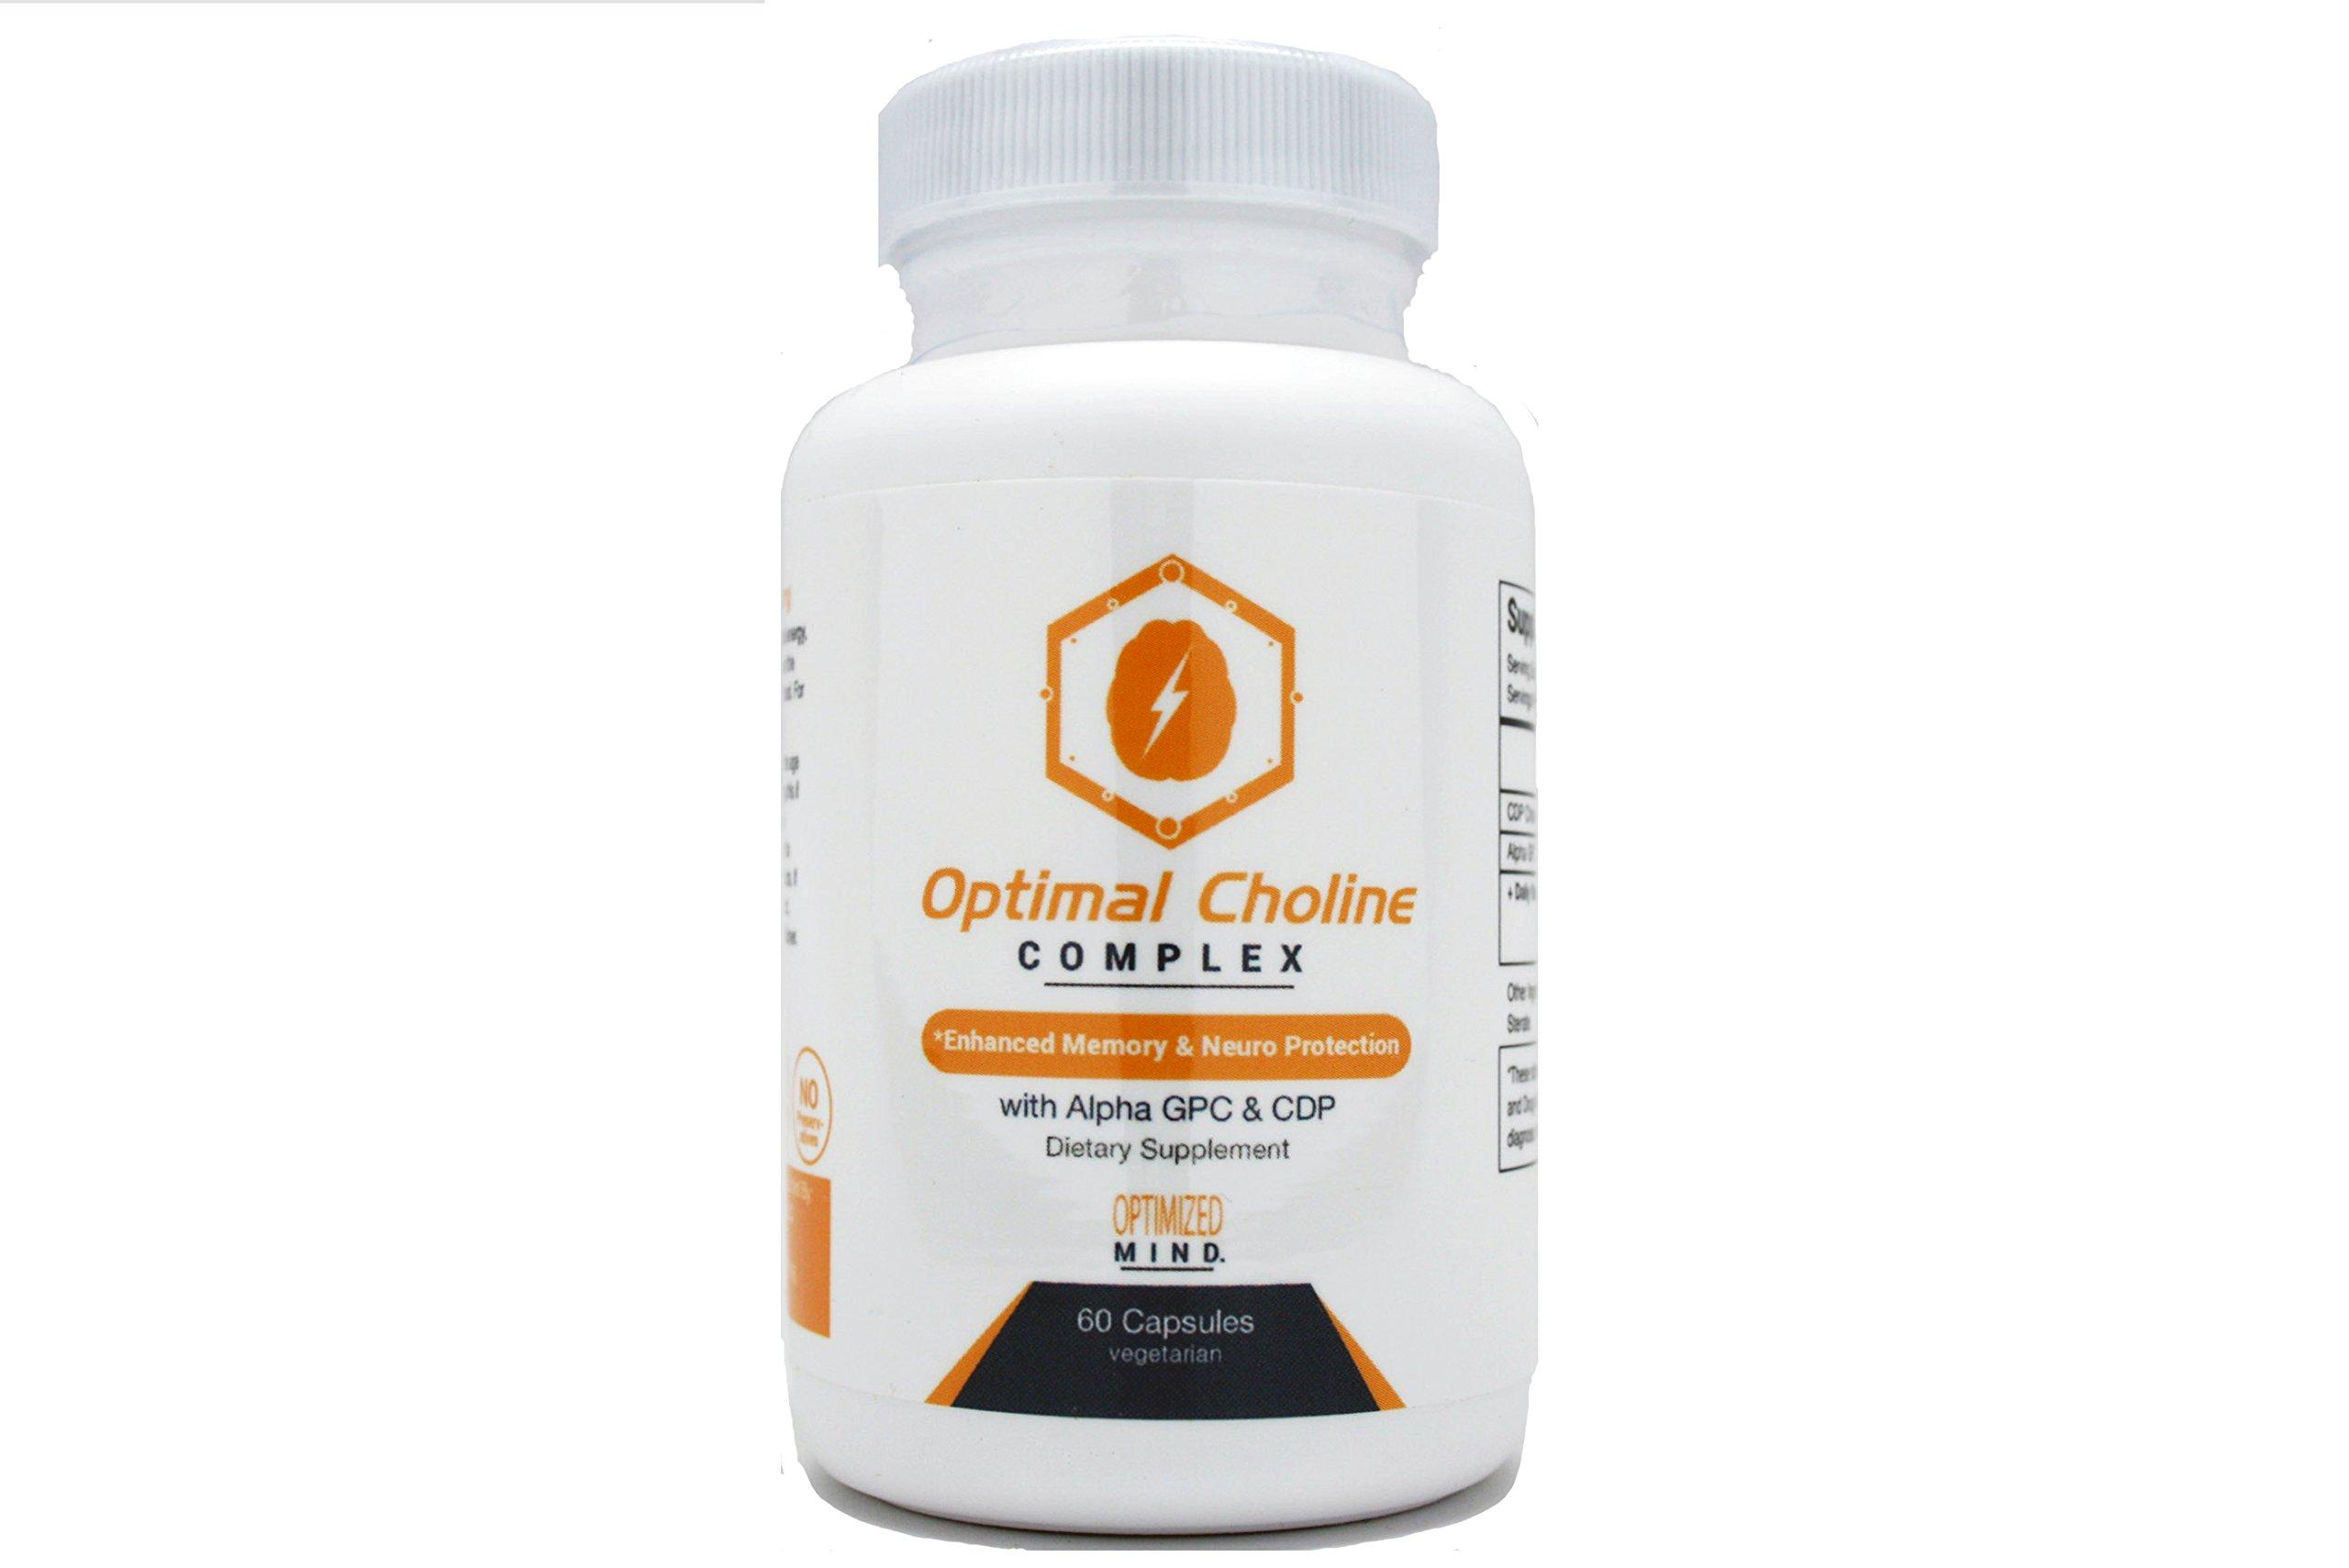 Optimal Choline Complex - Alpha GPC / Citicholine Blend - 300 mg Choline Supplement by Optimized Mind